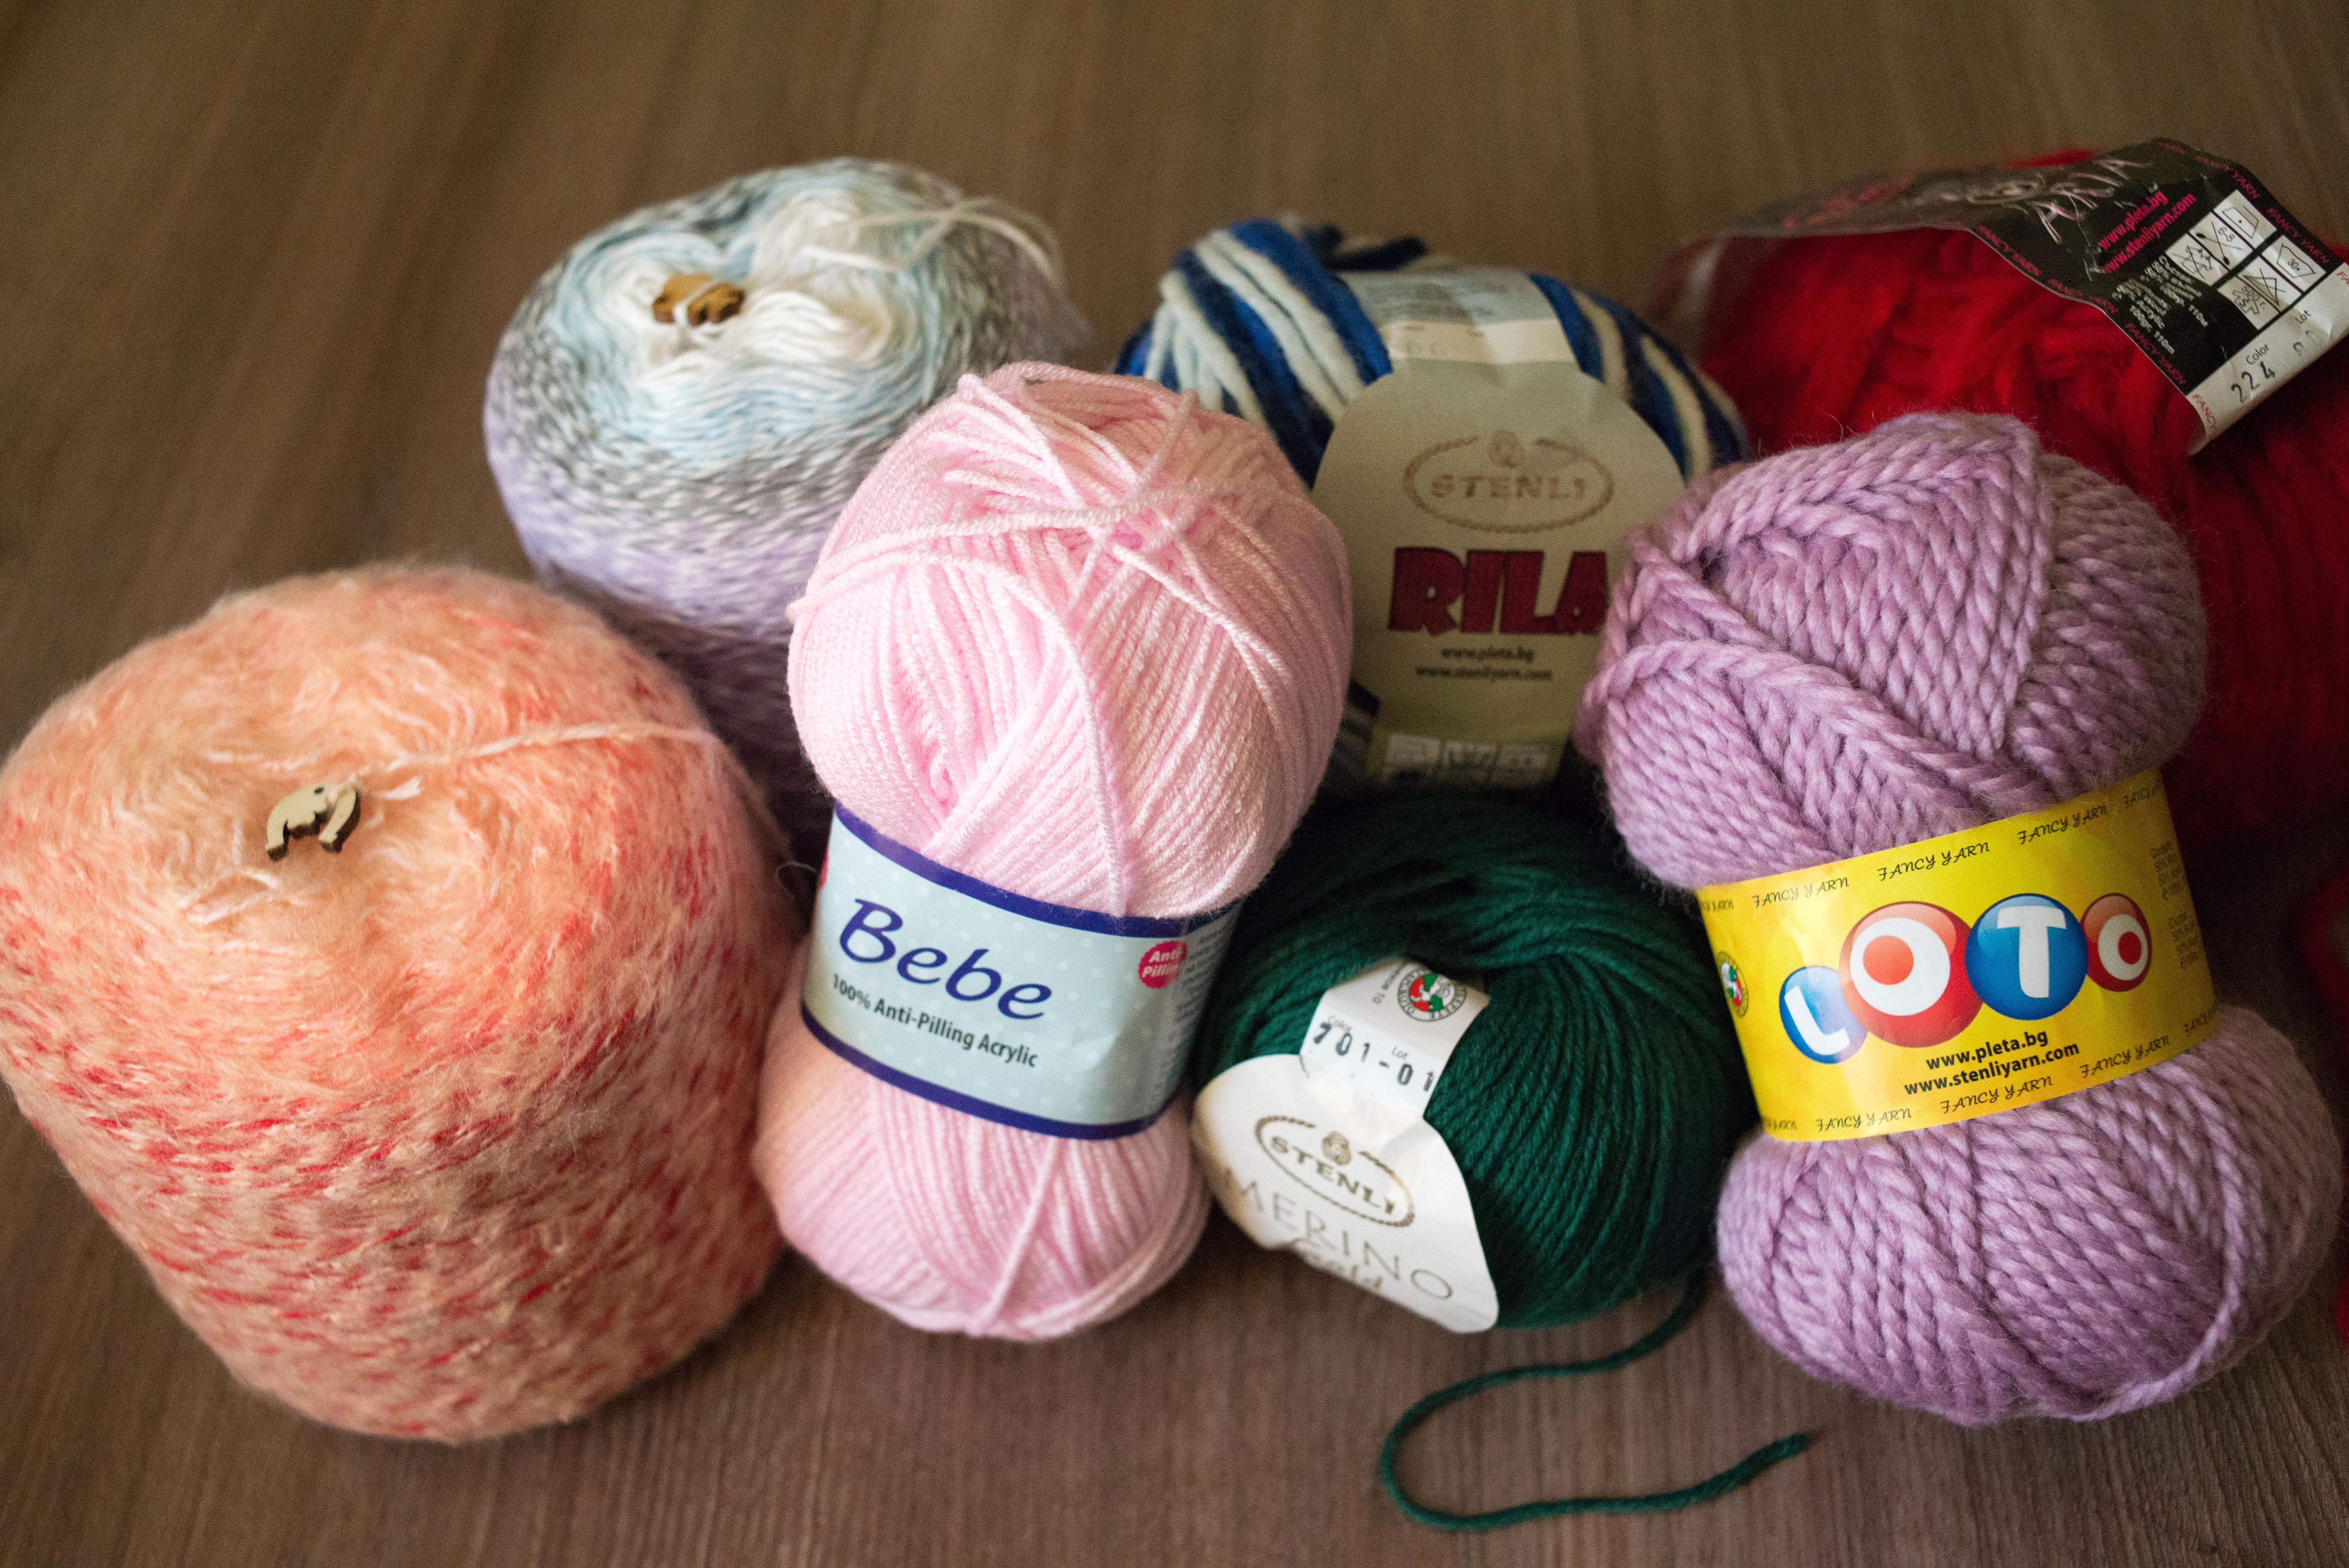 Some new yarn from Stenli